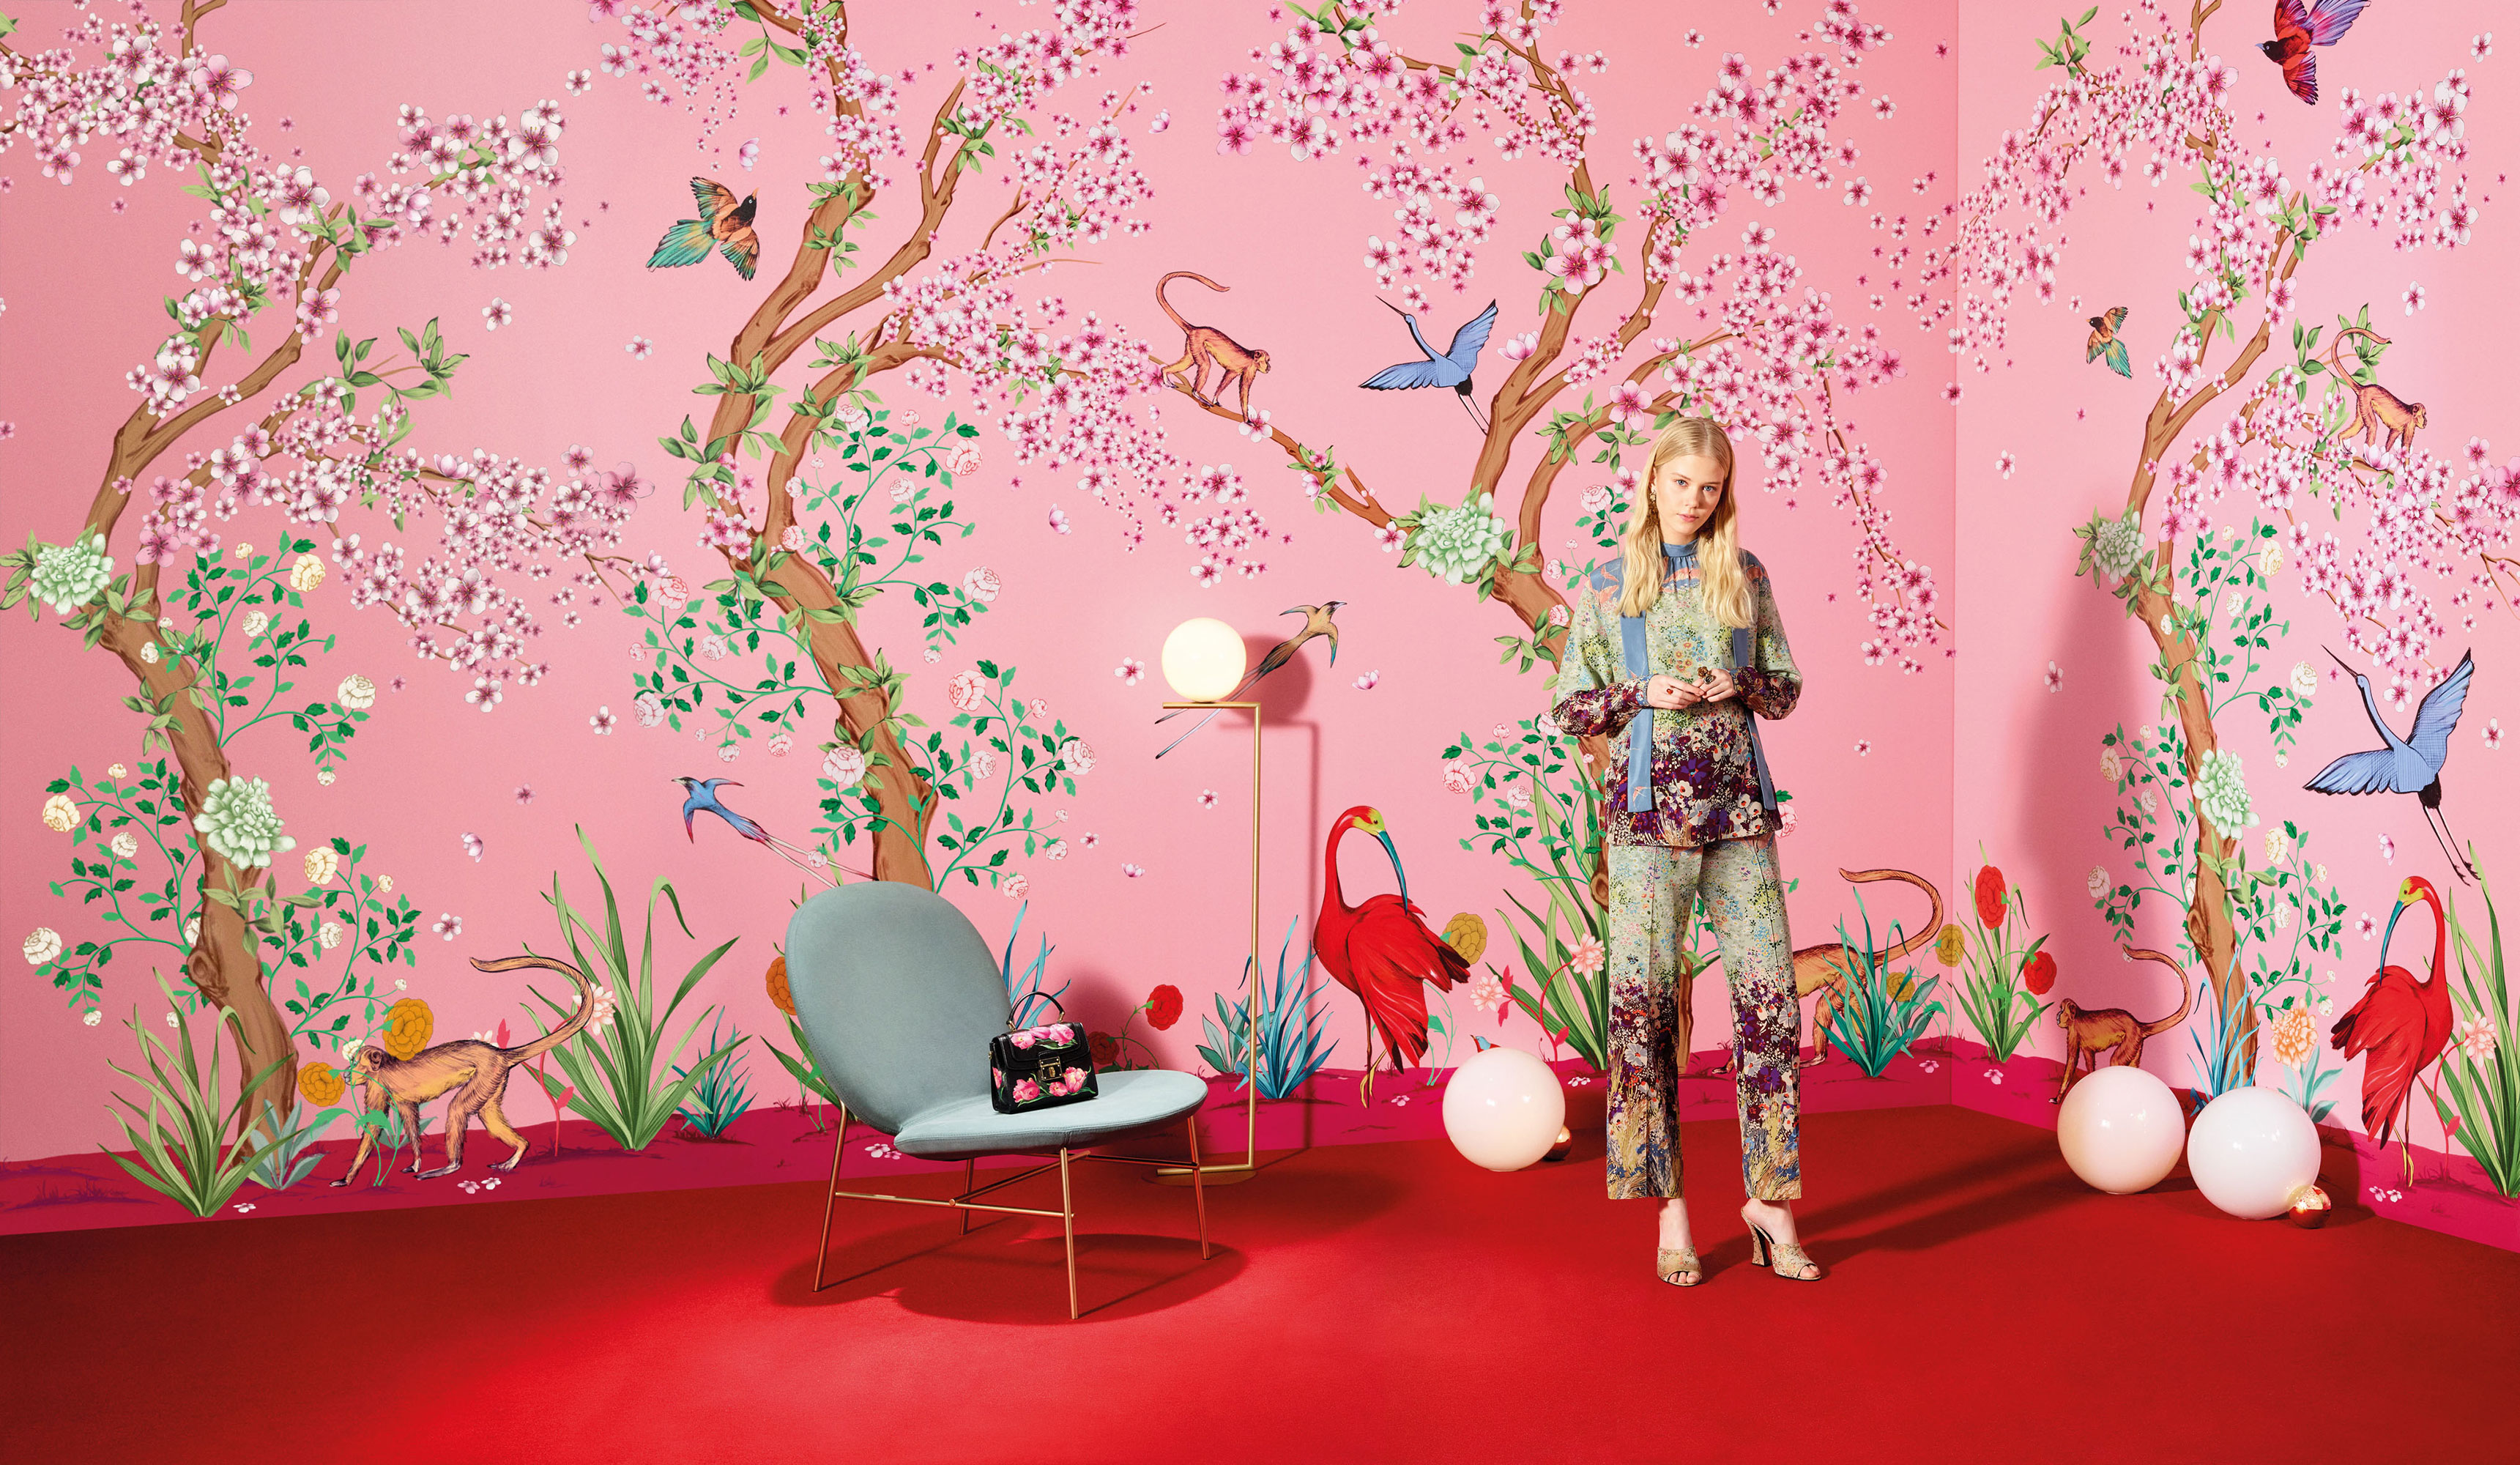 Yoox Japan 2017 ADV | Matteo Gastel | Yoox | Gioia | Camilla Rolla | Numerique Retouch Photo Retouching Studio